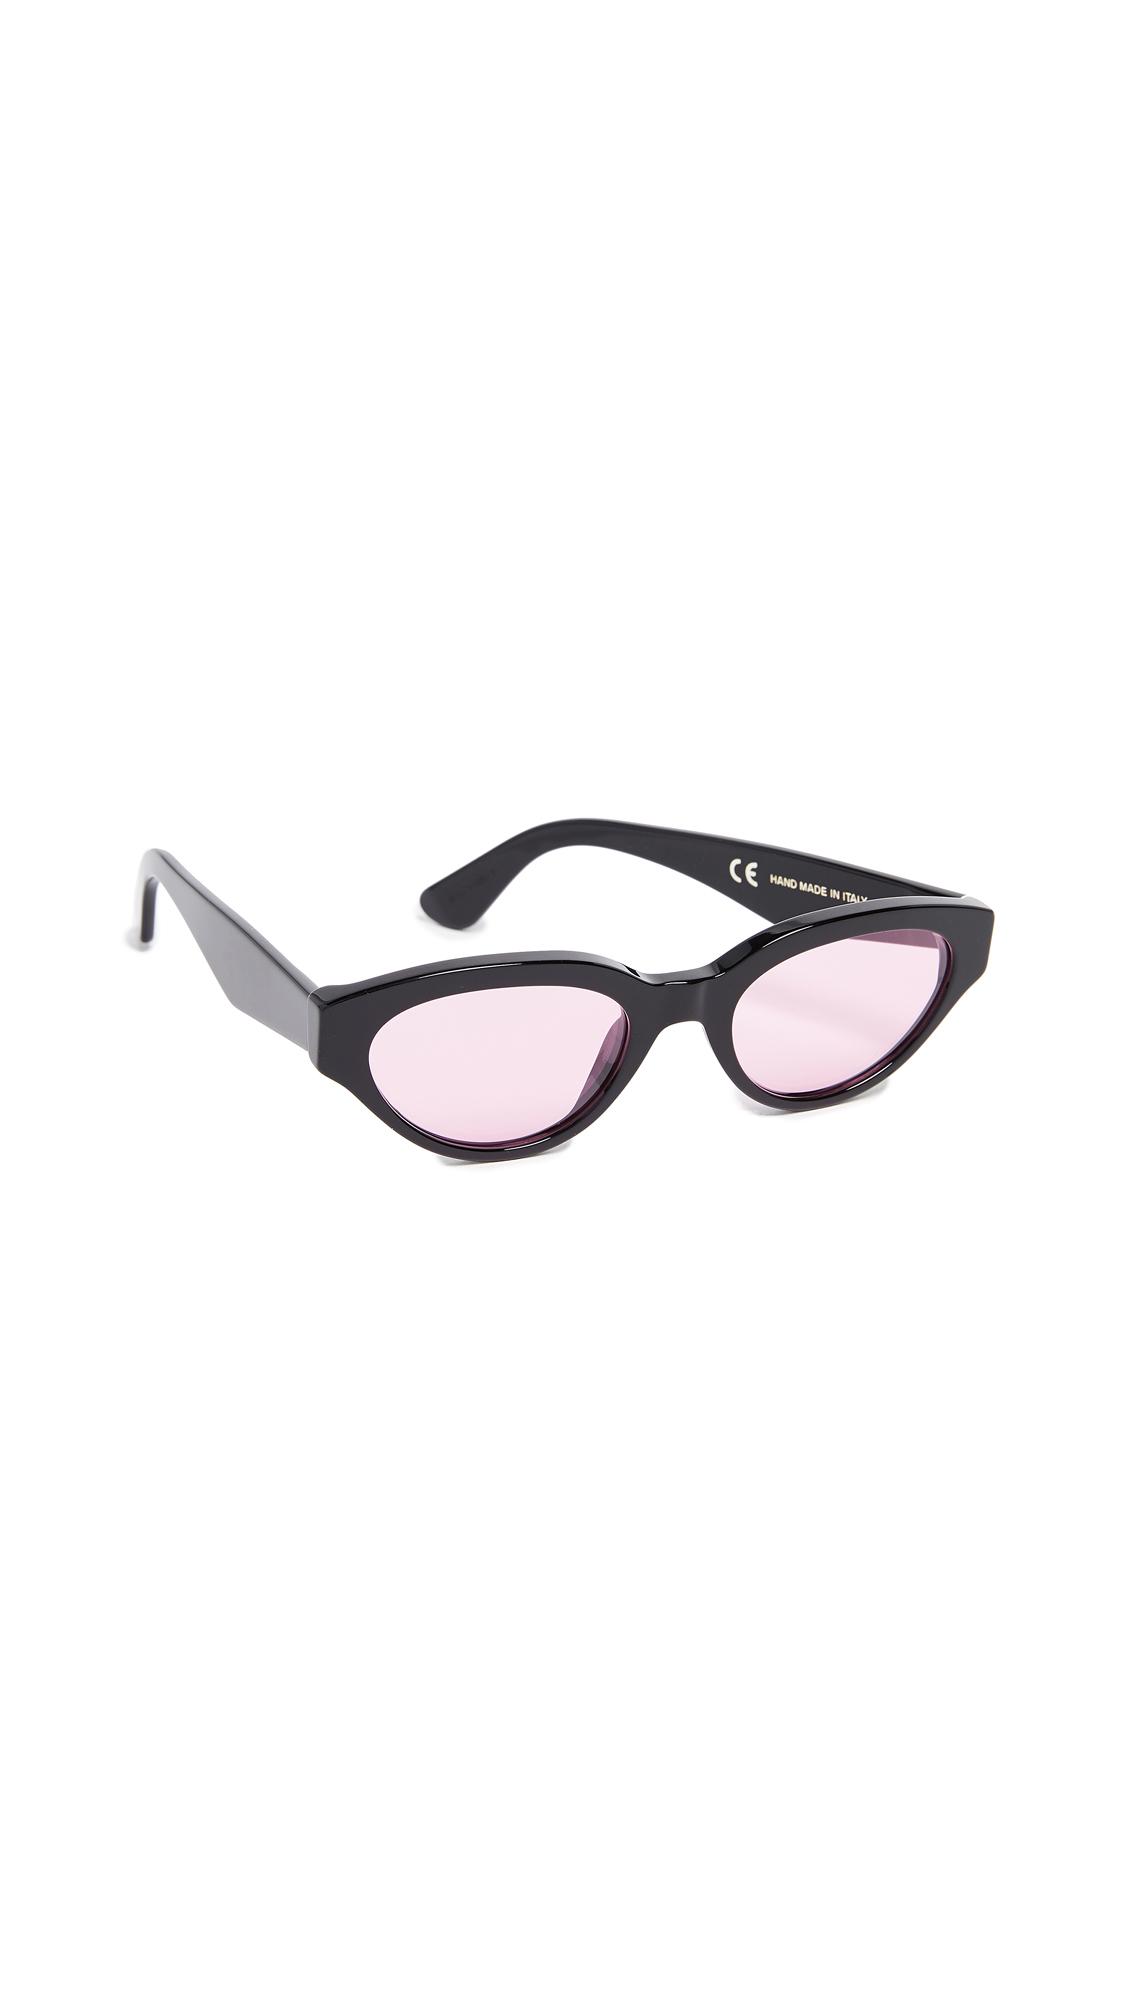 SUPER SUNGLASSES Drew Sunglasses in Black Pink